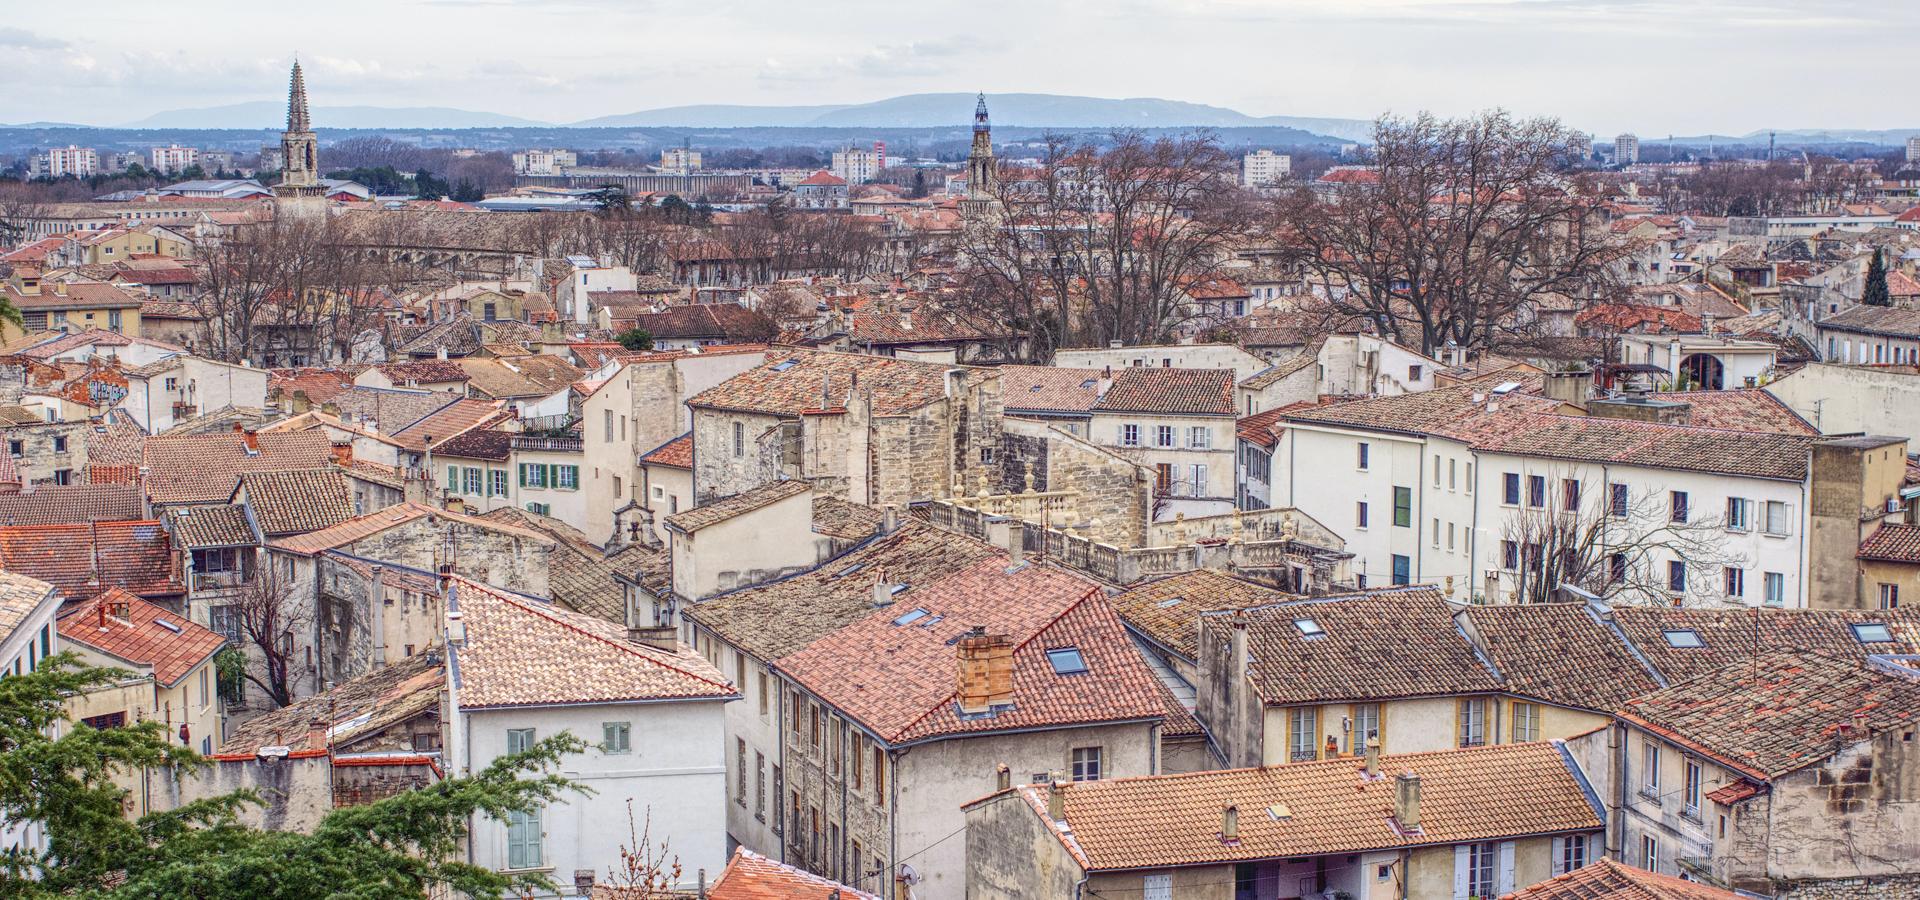 Peer-to-peer advisory in Avignon, Vaucluse, Provence-Alpes-Côte d'Azur, France